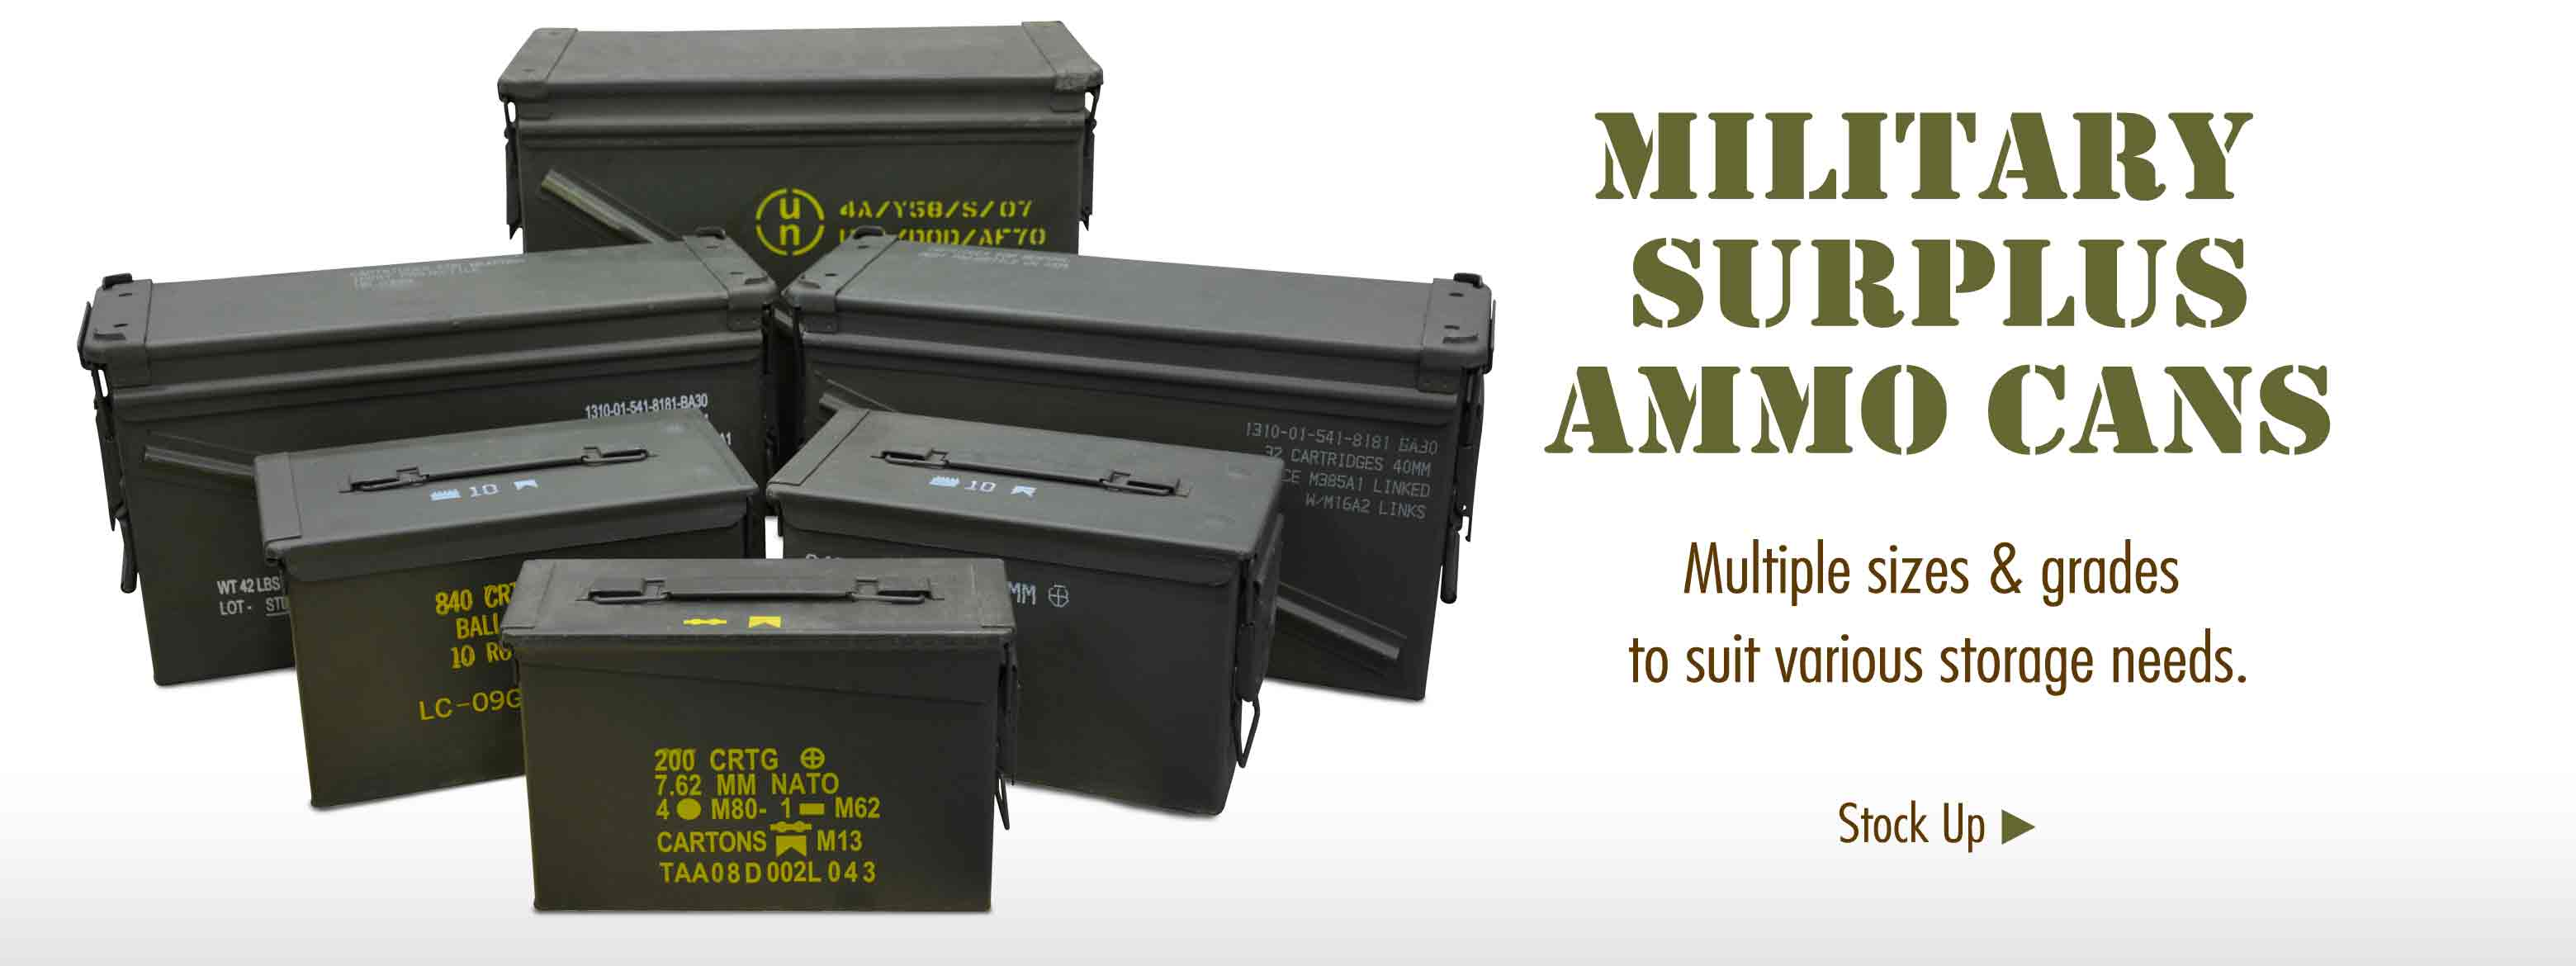 Military Surplus   Military Surplus Gun Parts -MidwayUSA